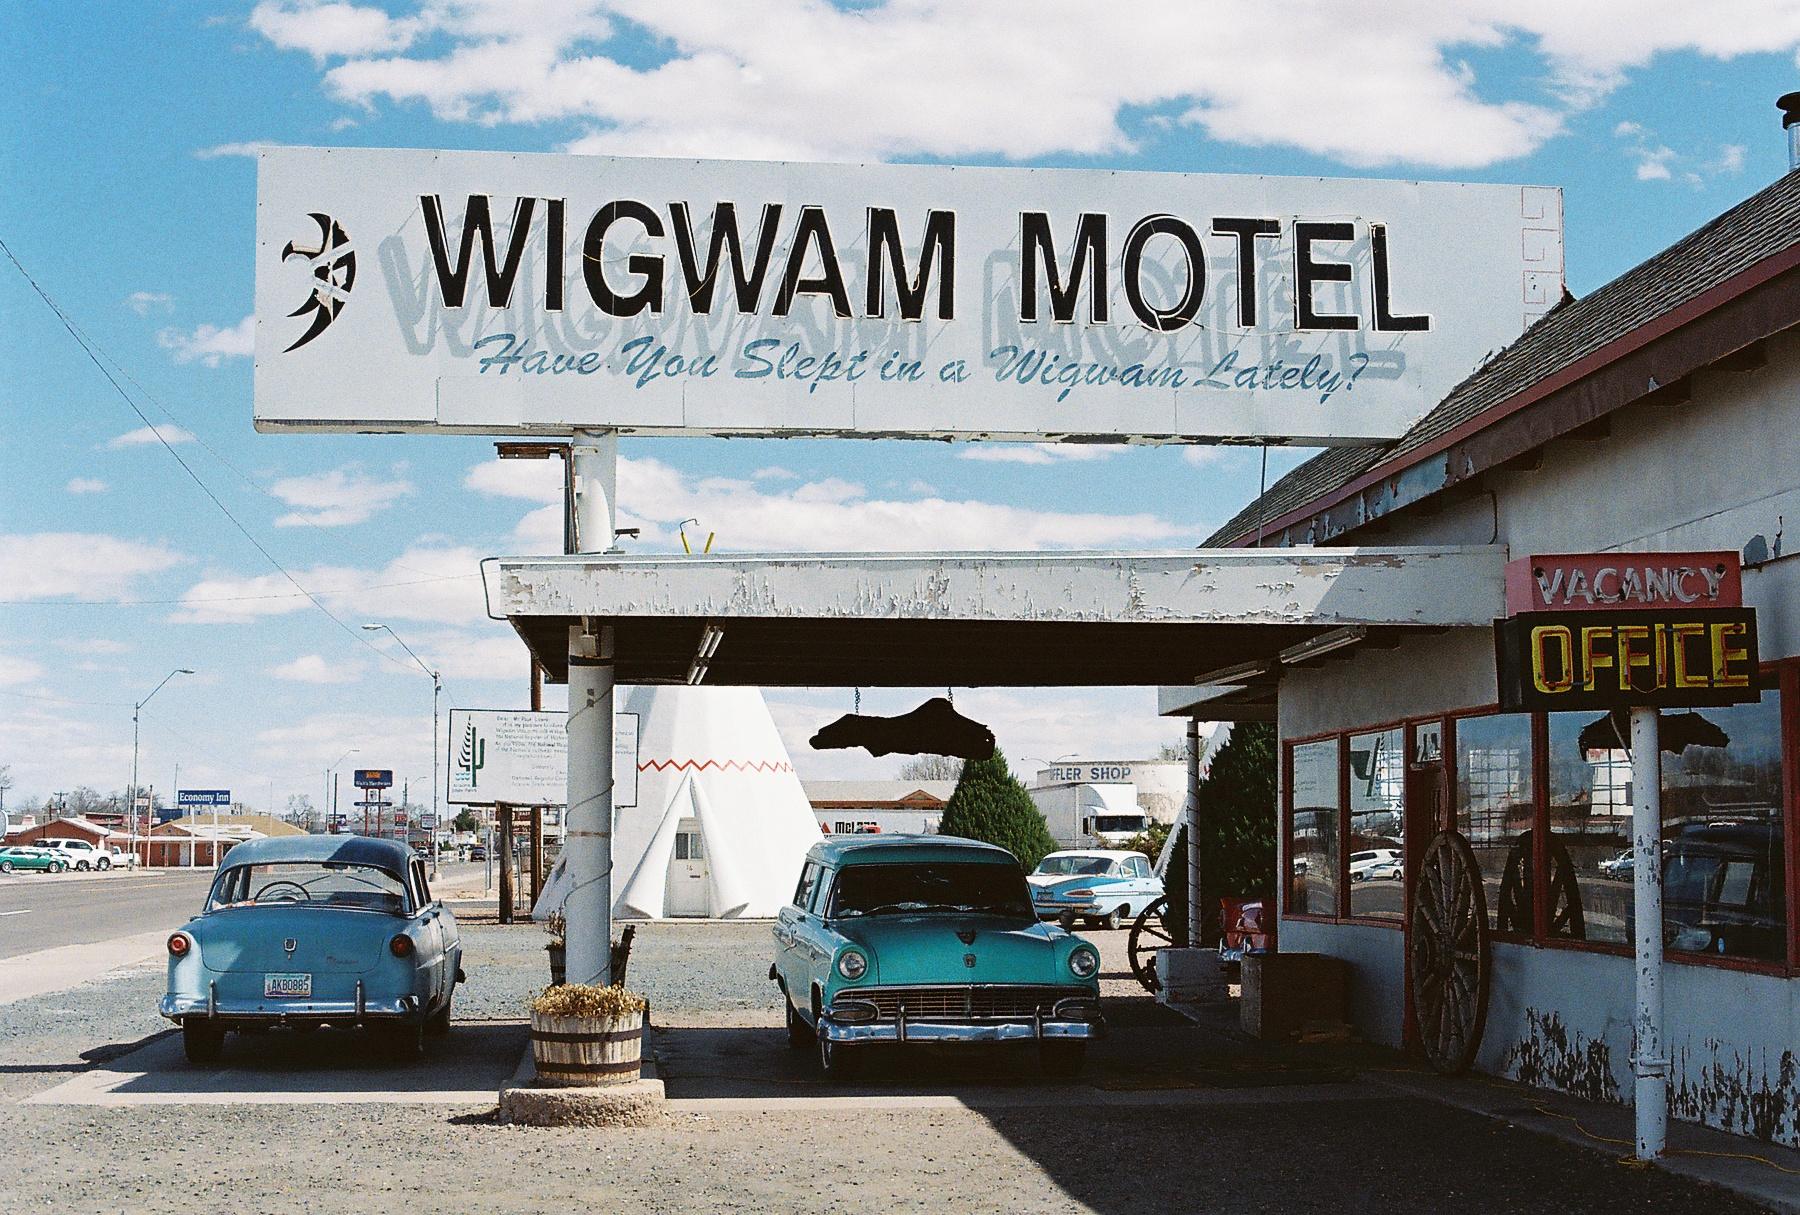 wigwam motel.jpg